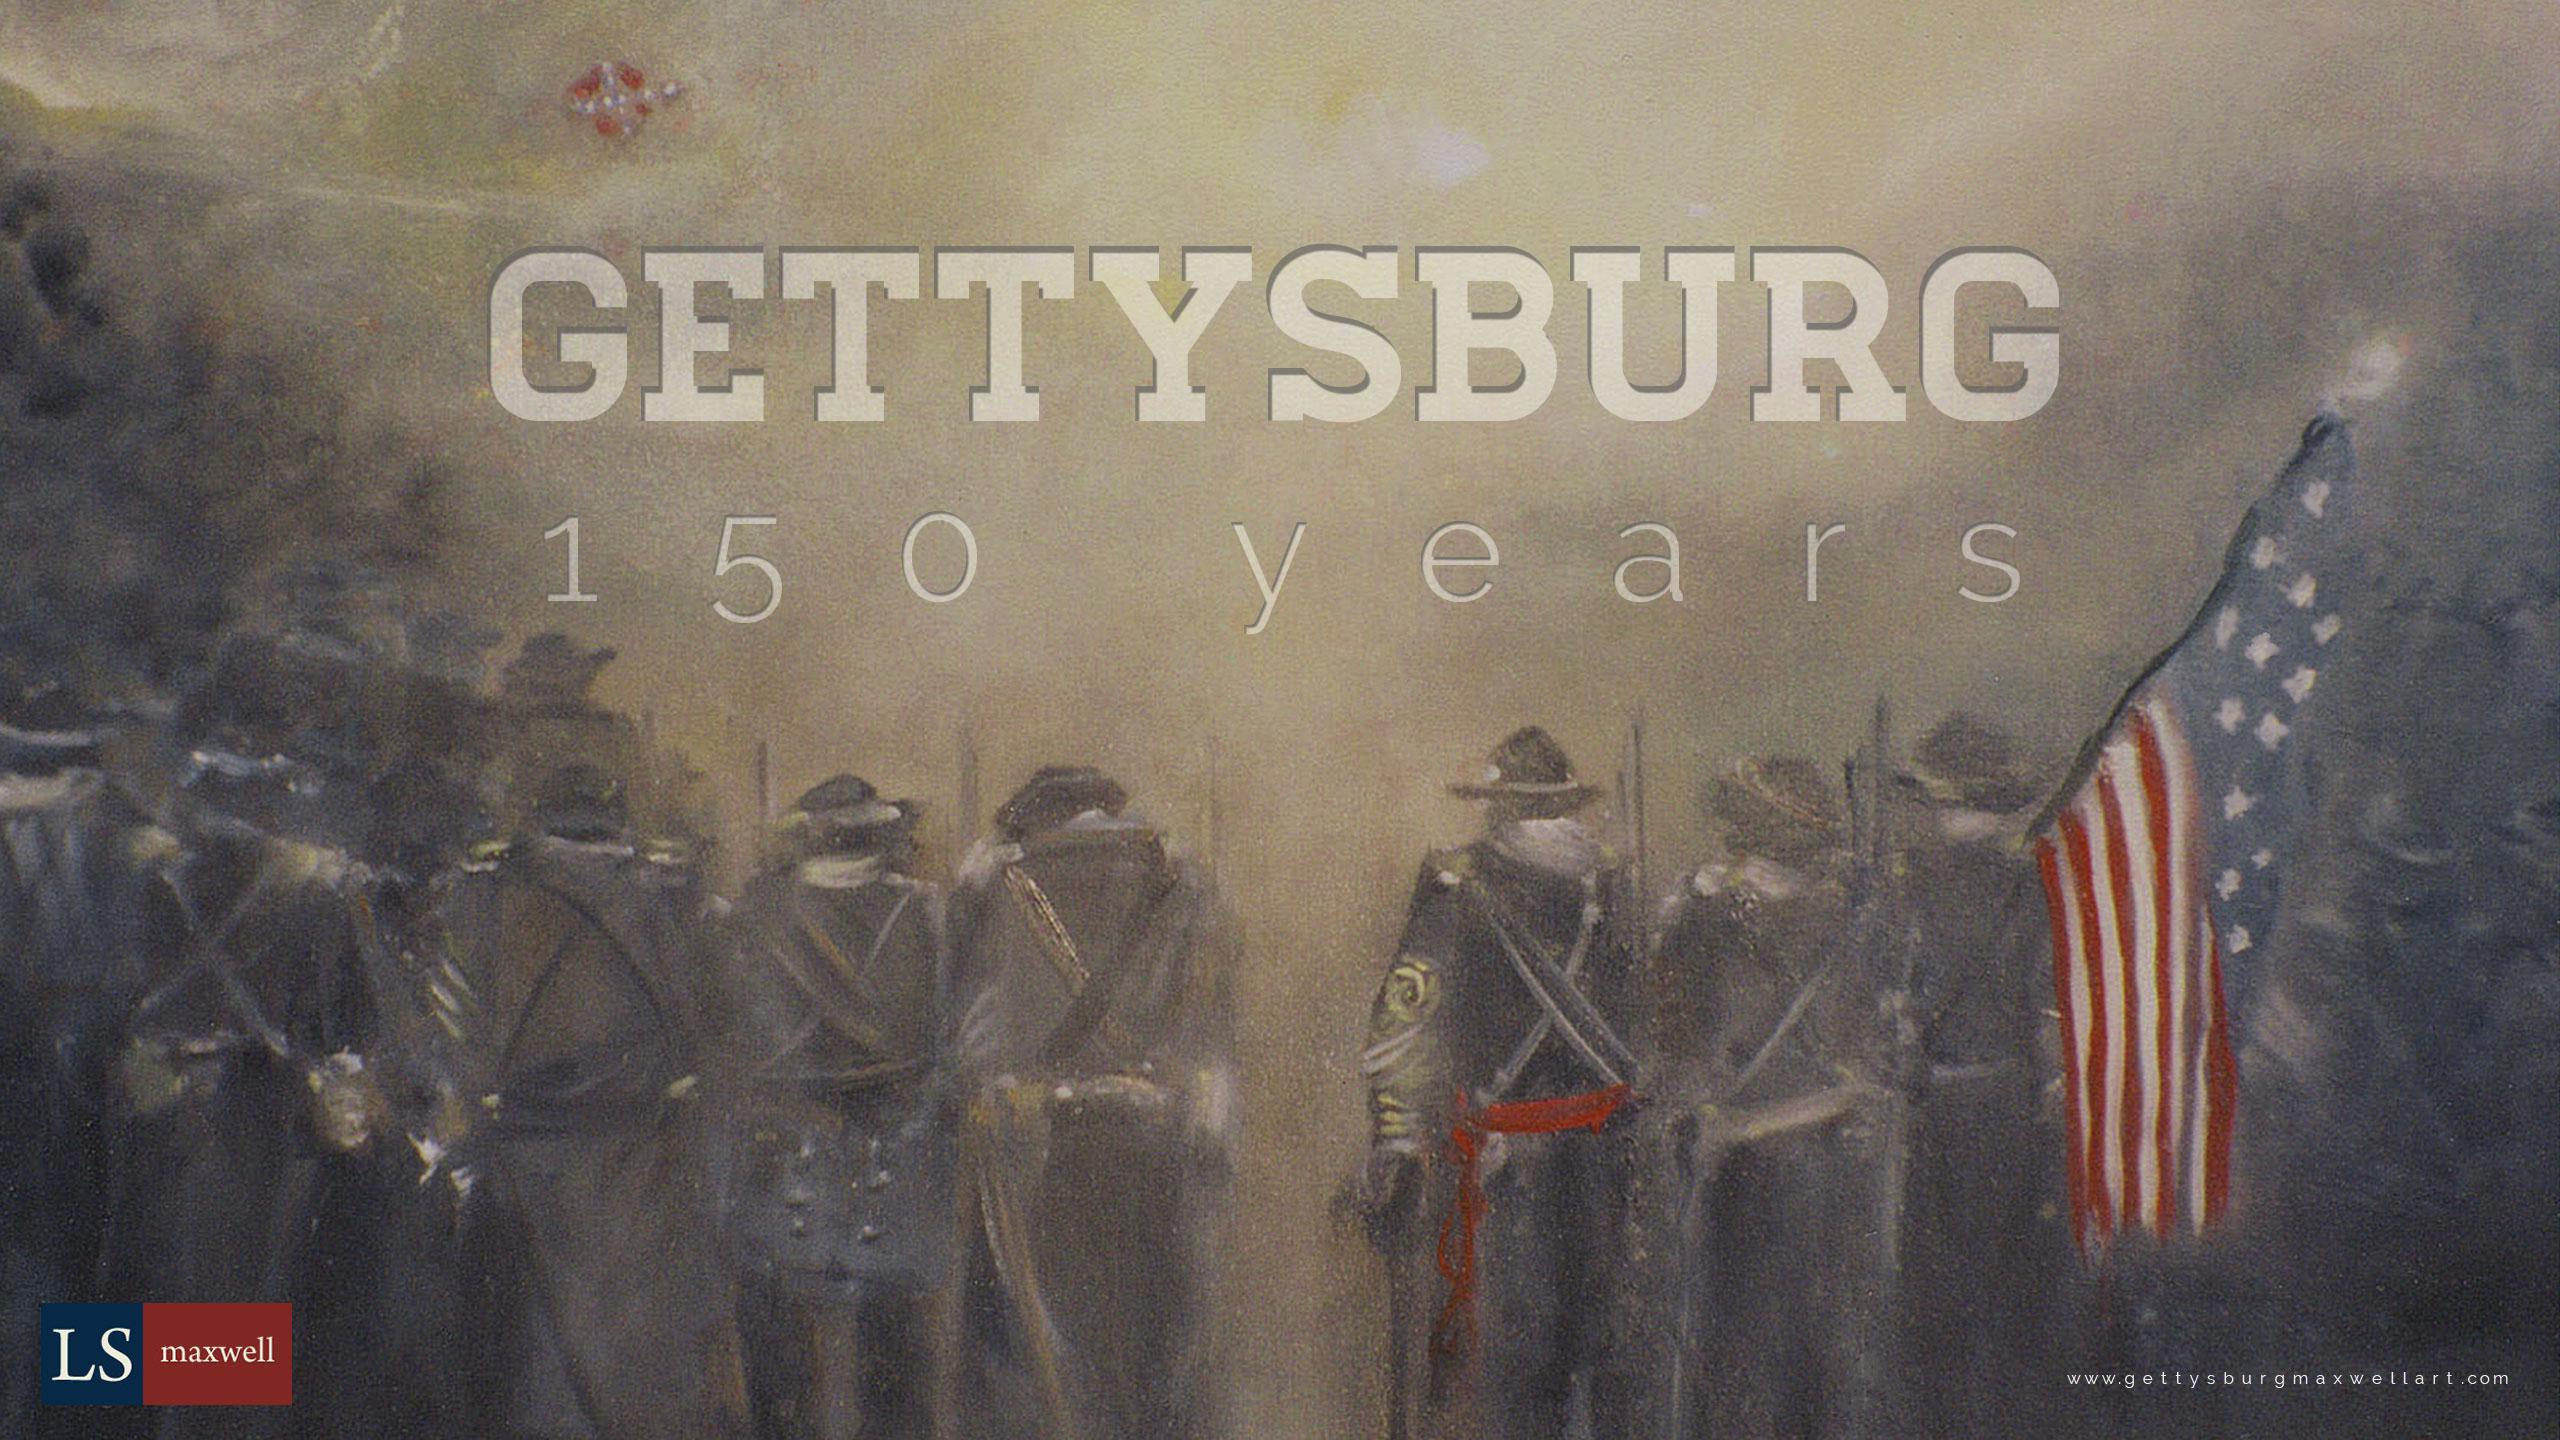 Gettysburg Wallpaper 2560x1440